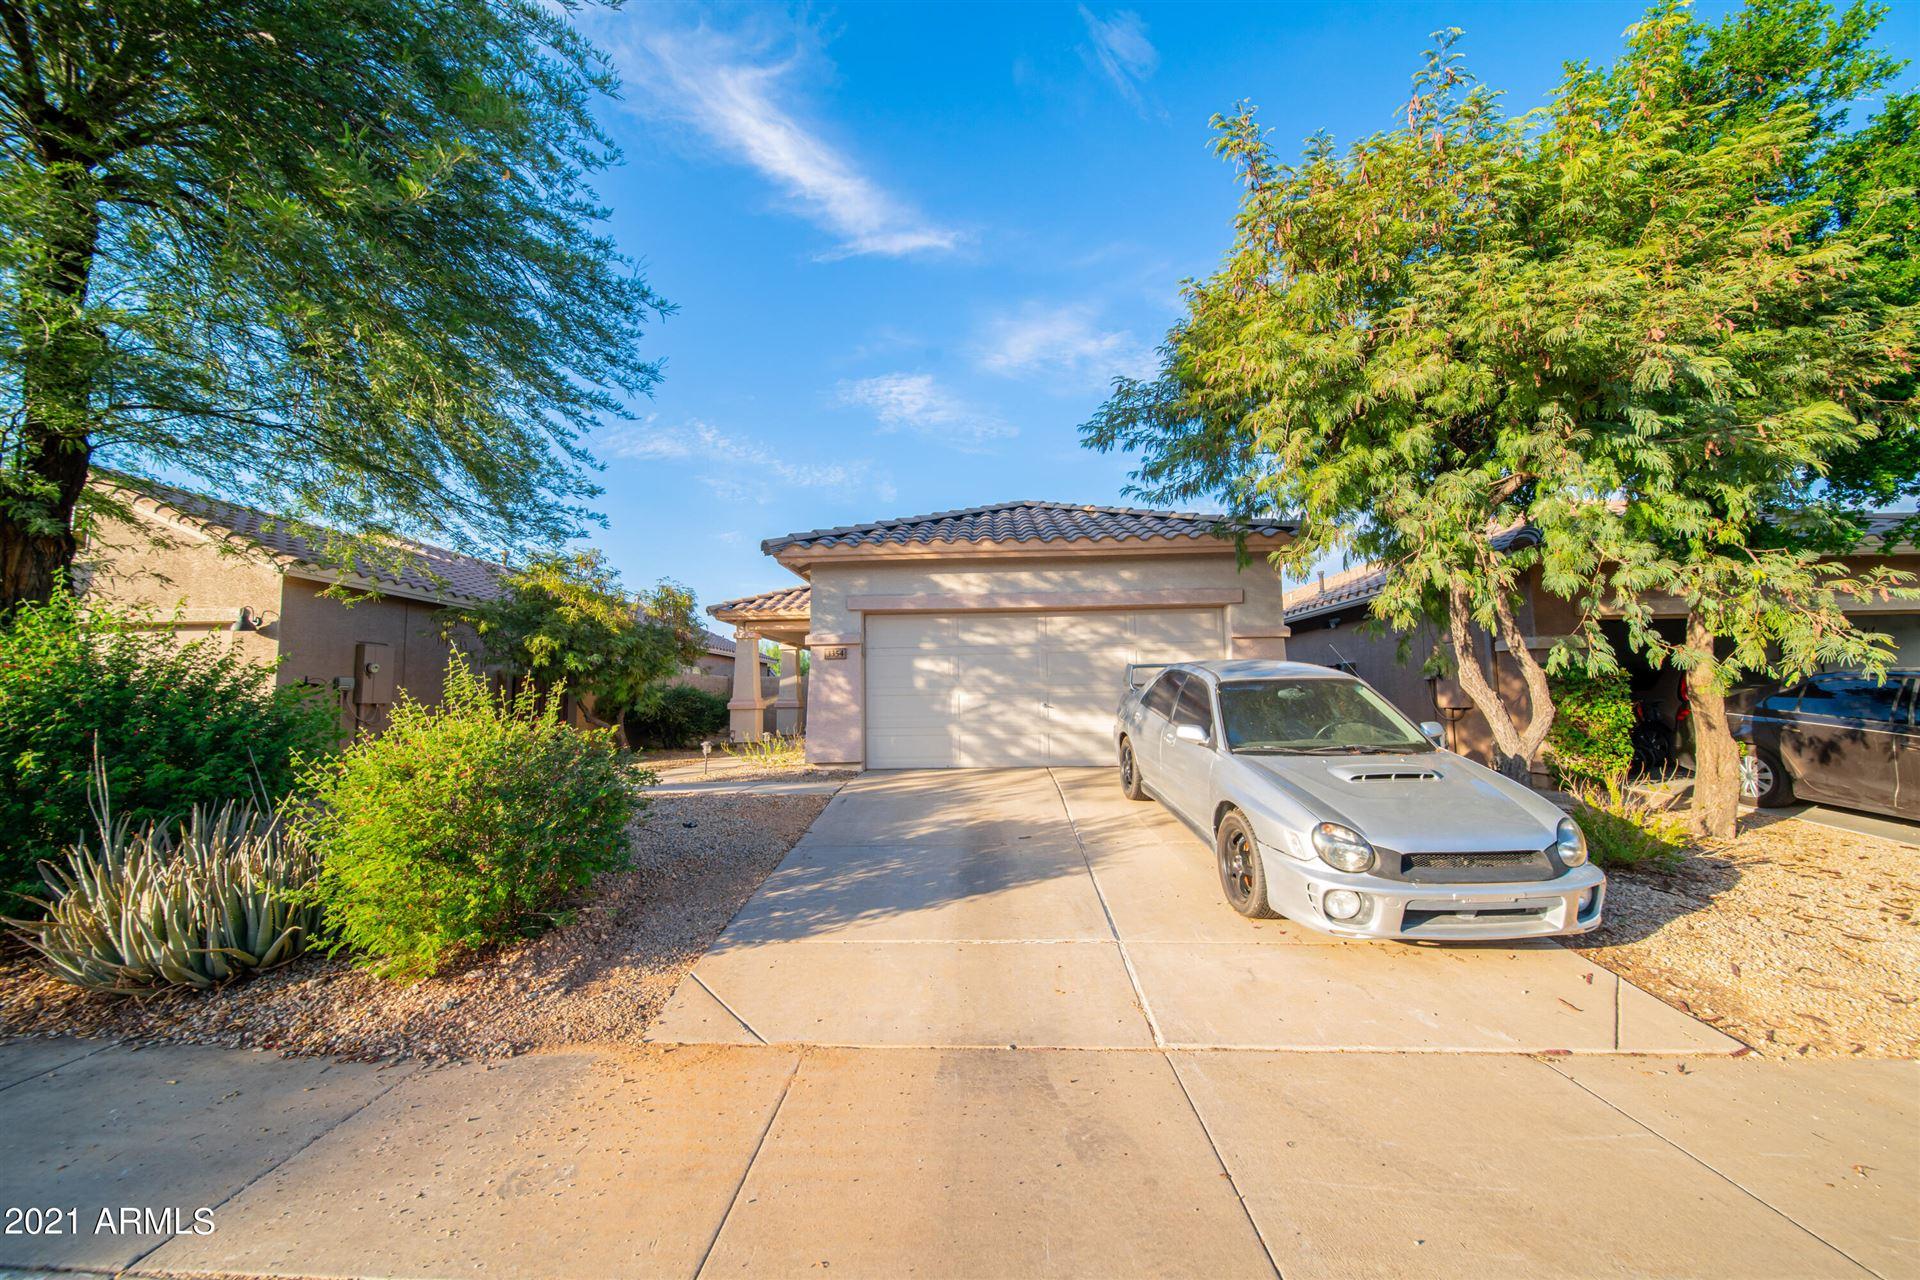 Photo of 3354 W STEINBECK Drive, Anthem, AZ 85086 (MLS # 6283470)